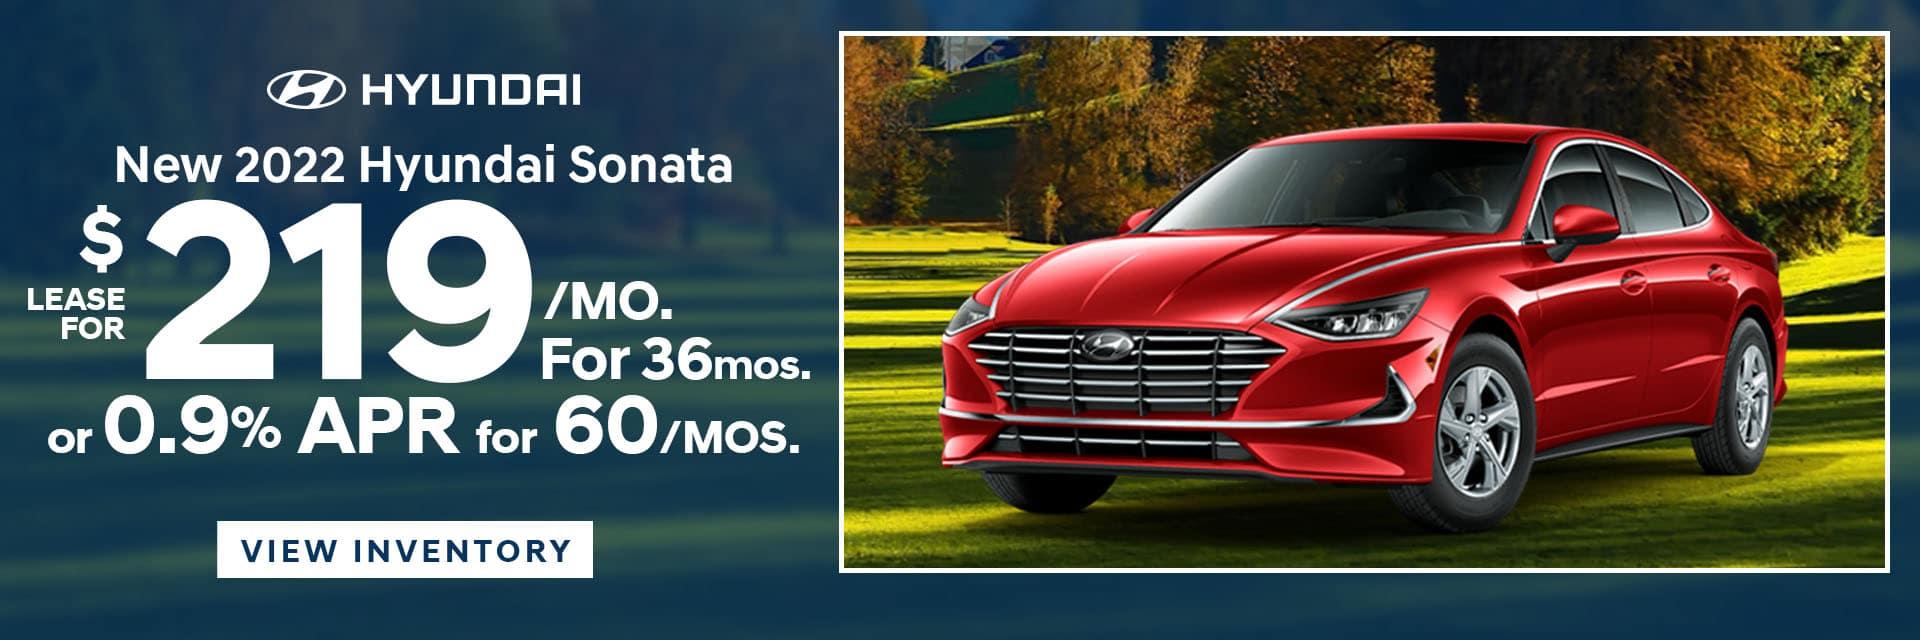 CHOH-October 20212021 Hyundai Sonata copy